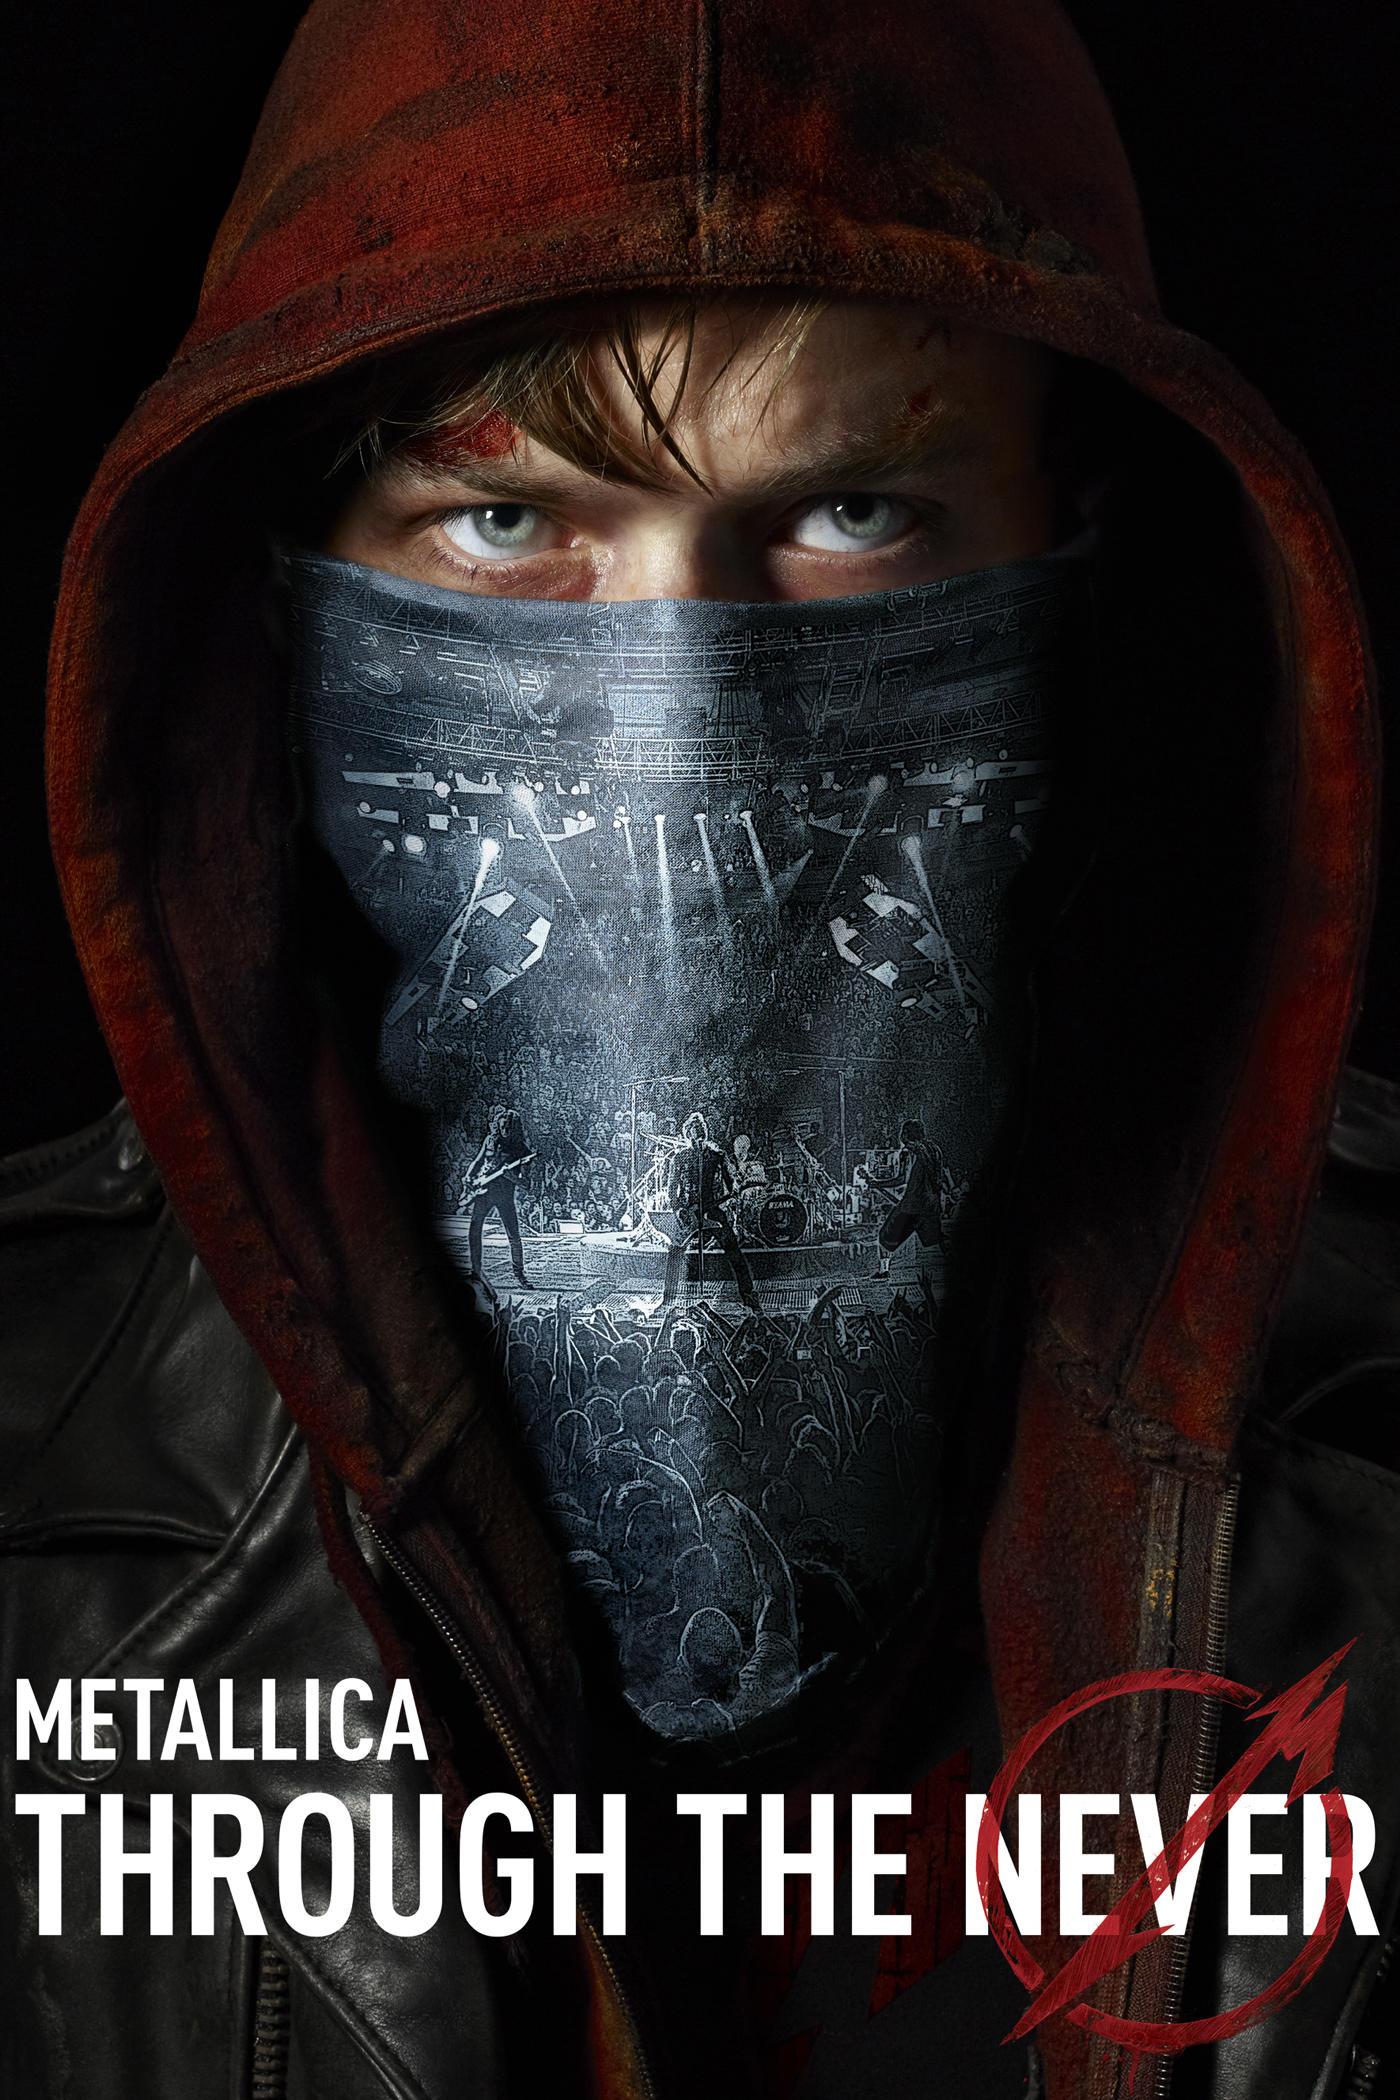 Metallica Through The Never [iTunes Movie Full HD]